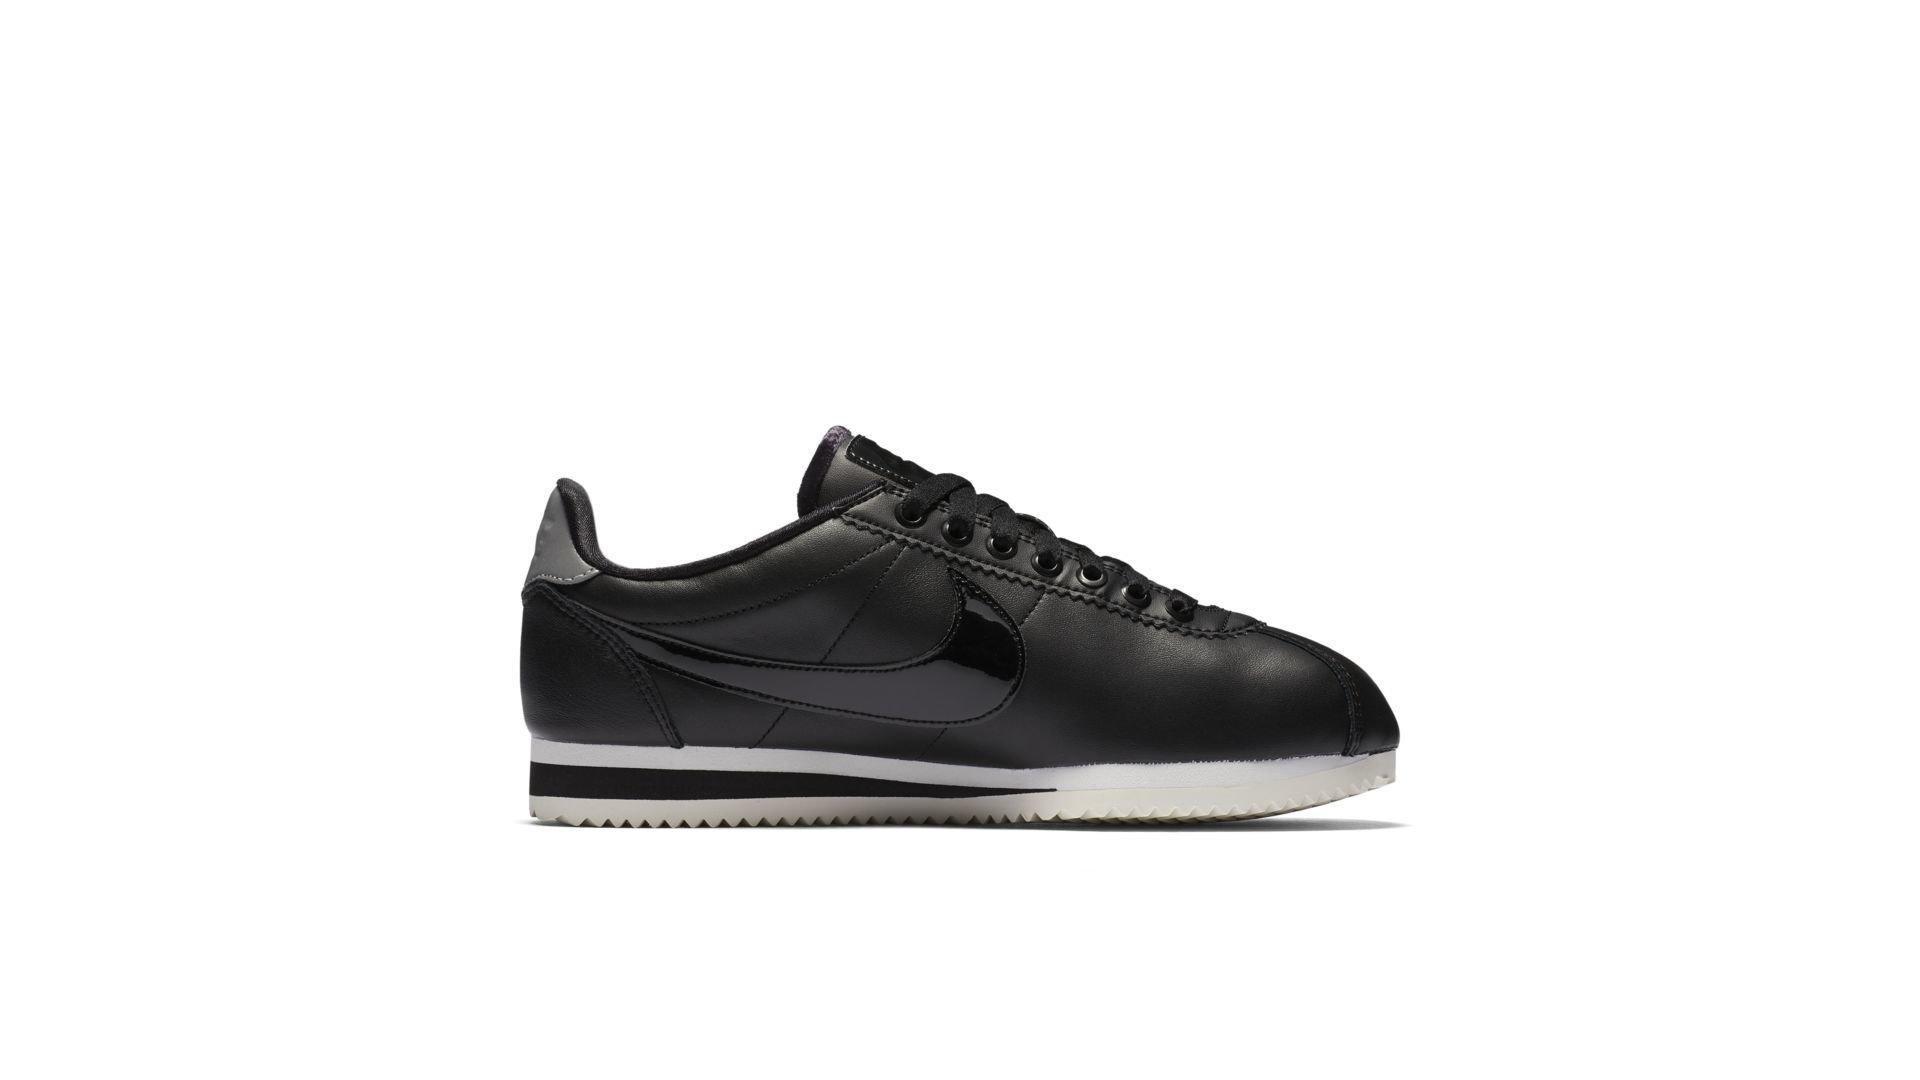 Nike Classic Cortez Black Patent (W) (AJ0135-001)